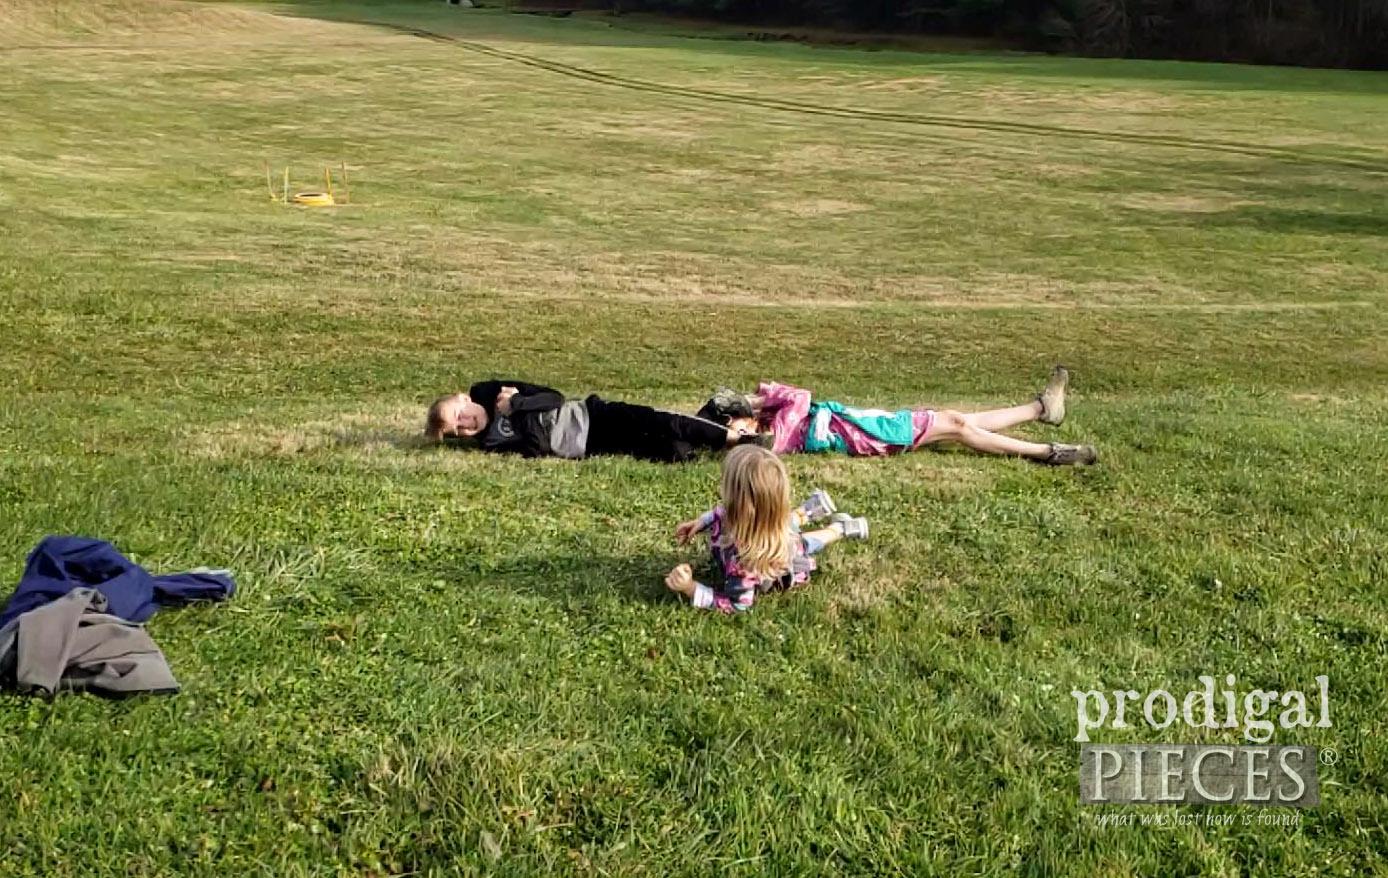 Kids Rolling Downhill | I choose joy | prodigalpieces.com